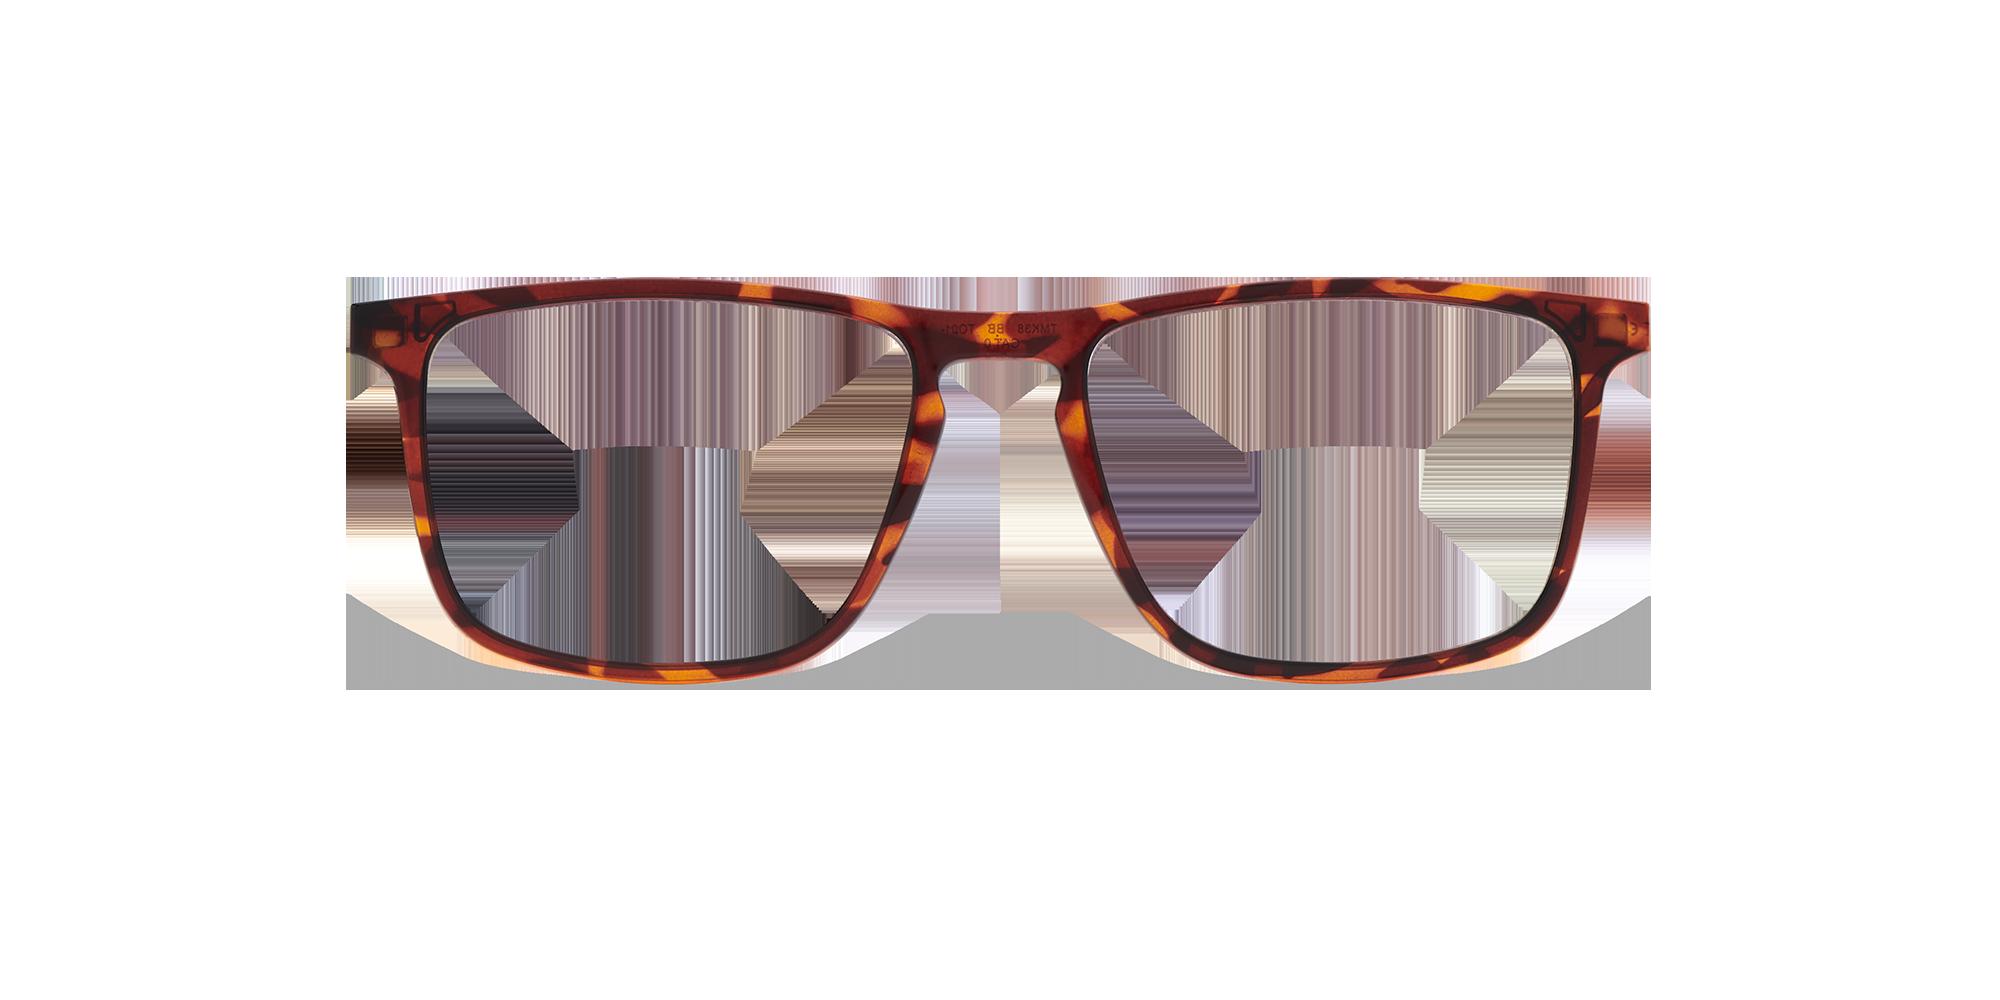 afflelou/france/products/smart_clip/clips_glasses/07630036428795_face.png